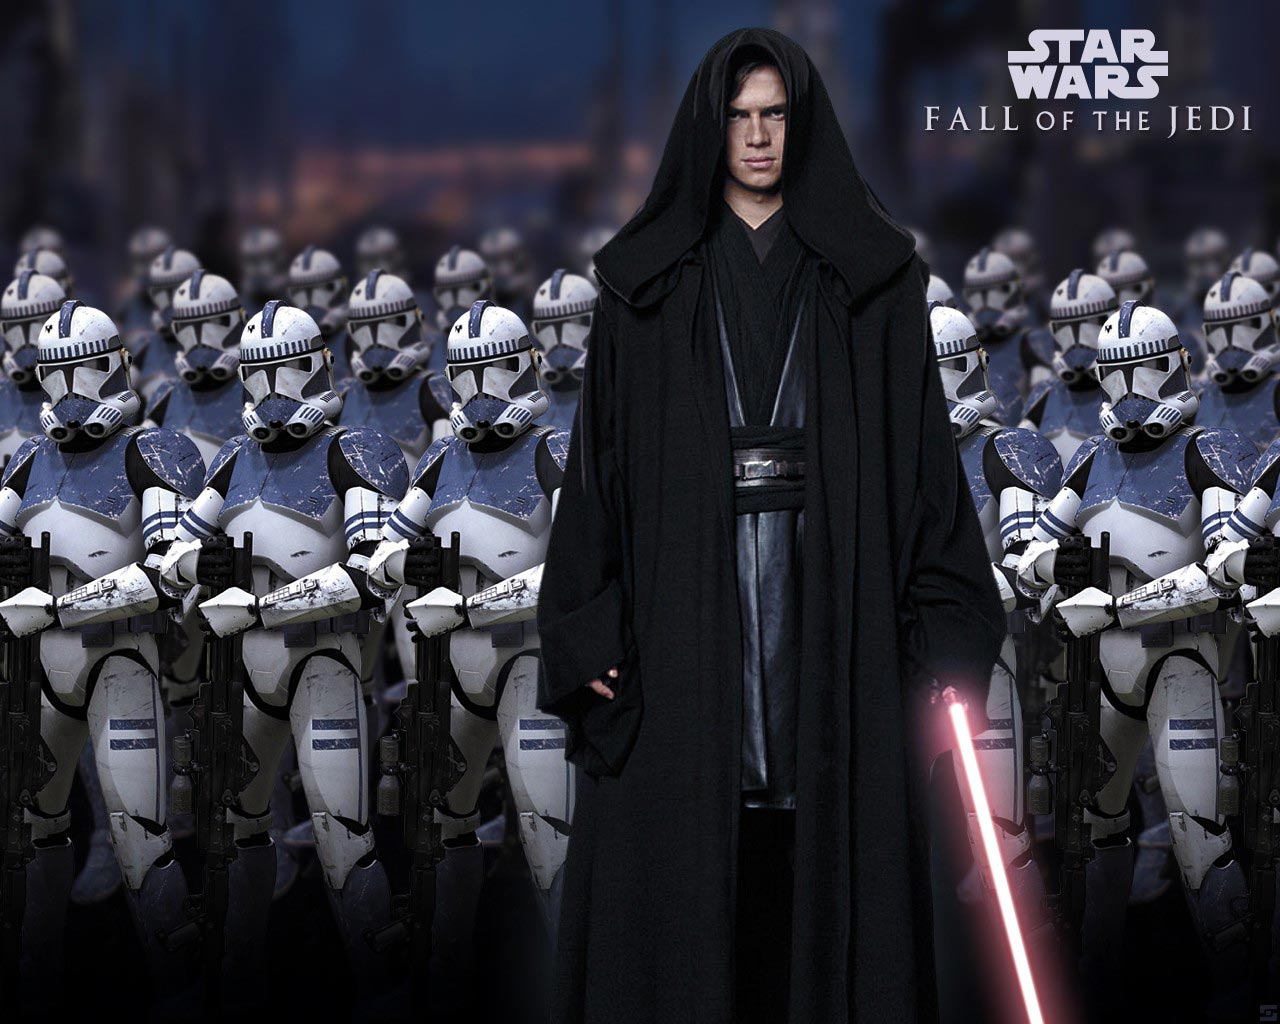 Star Wars Anakin Skywalker Wallpaper - WallpaperSafari